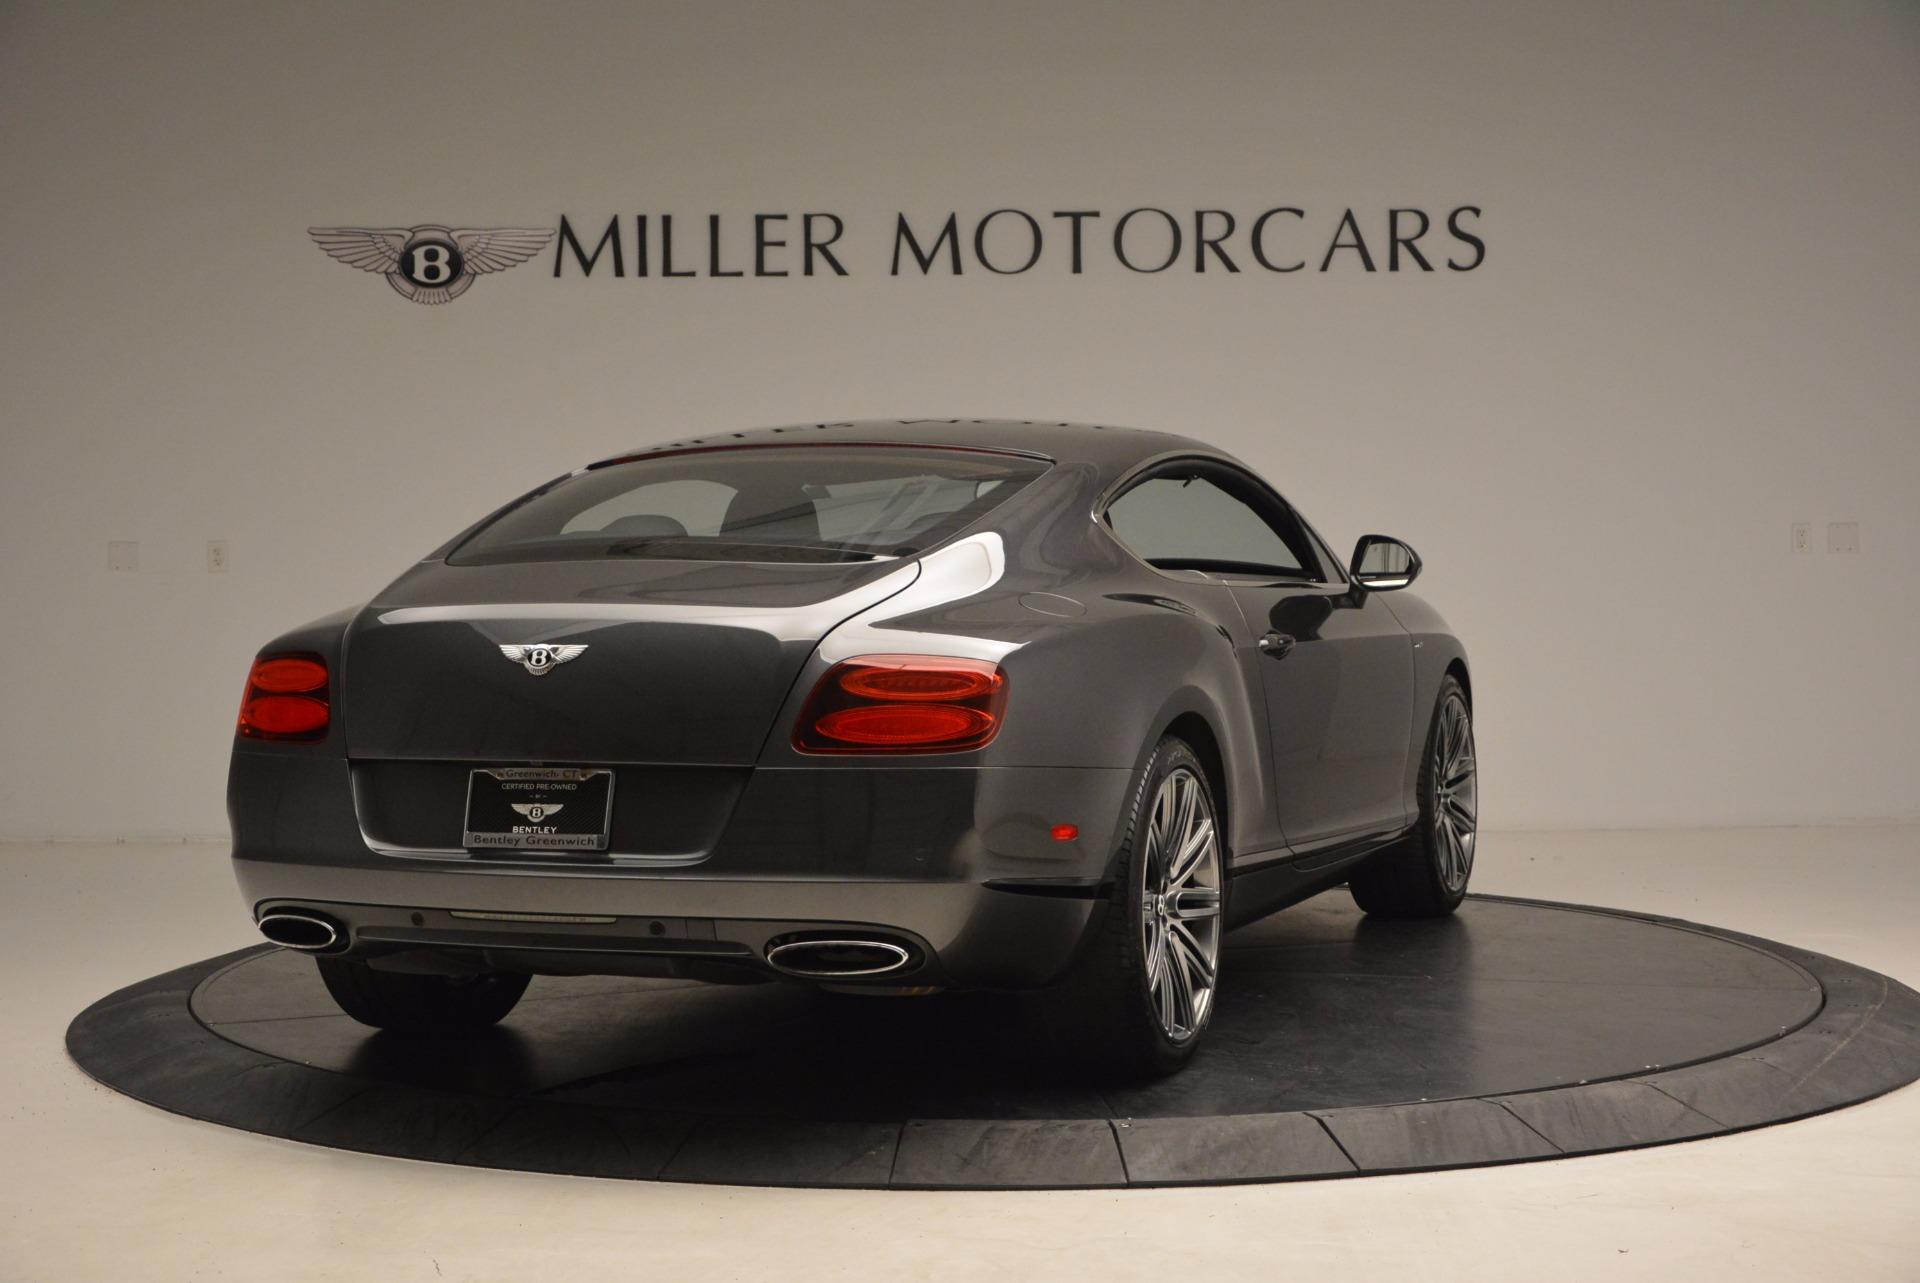 Used 2014 Bentley Continental GT Speed For Sale In Westport, CT 1473_p7